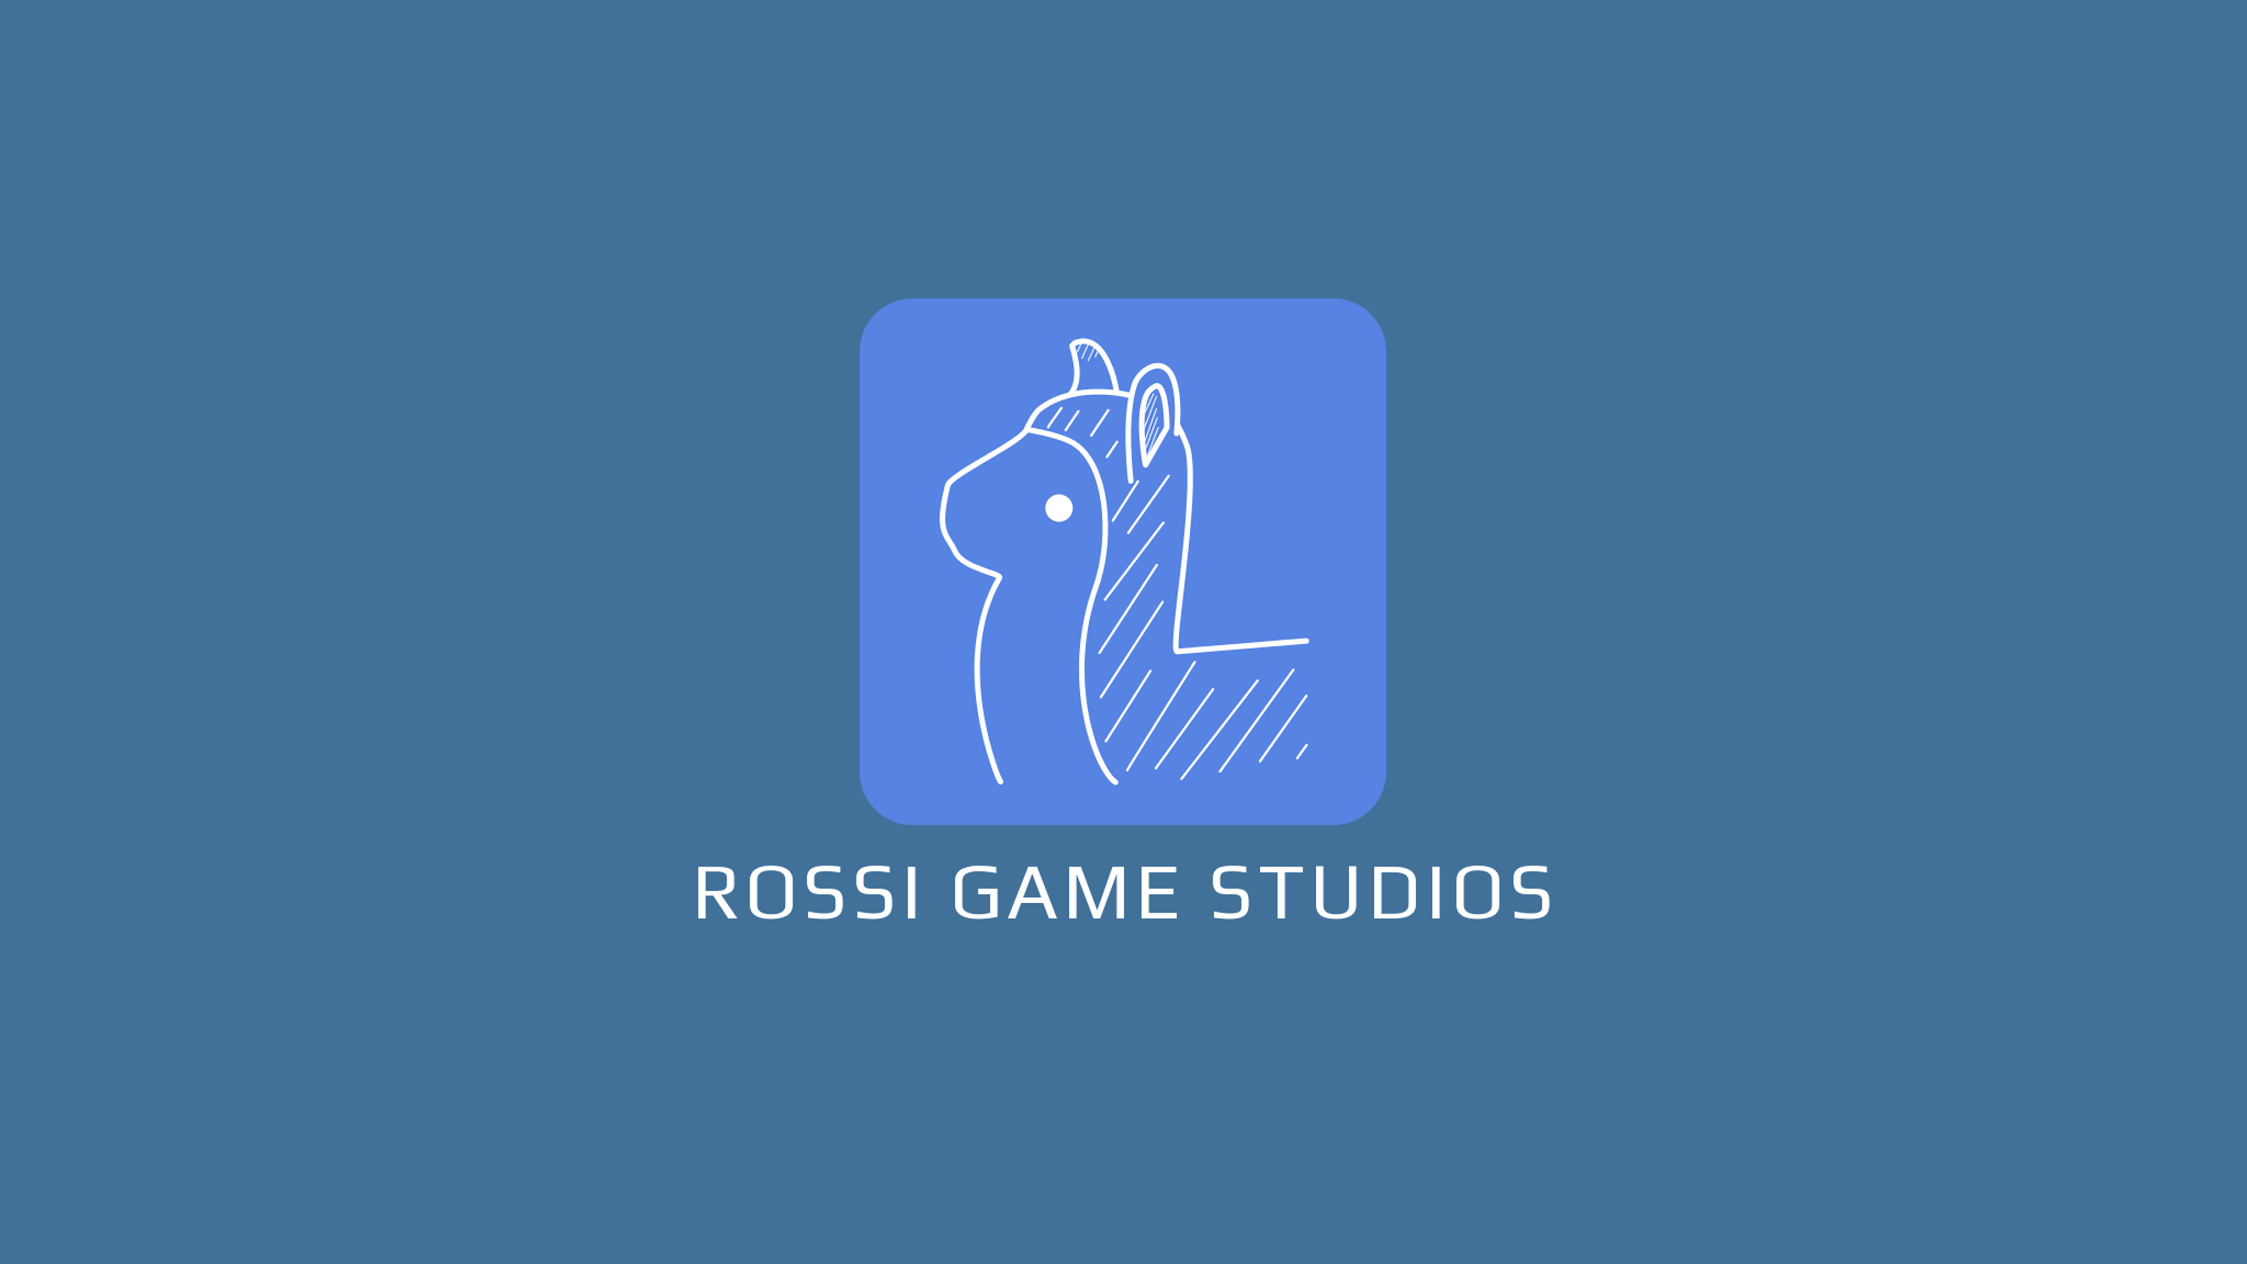 Rossi Game Studios